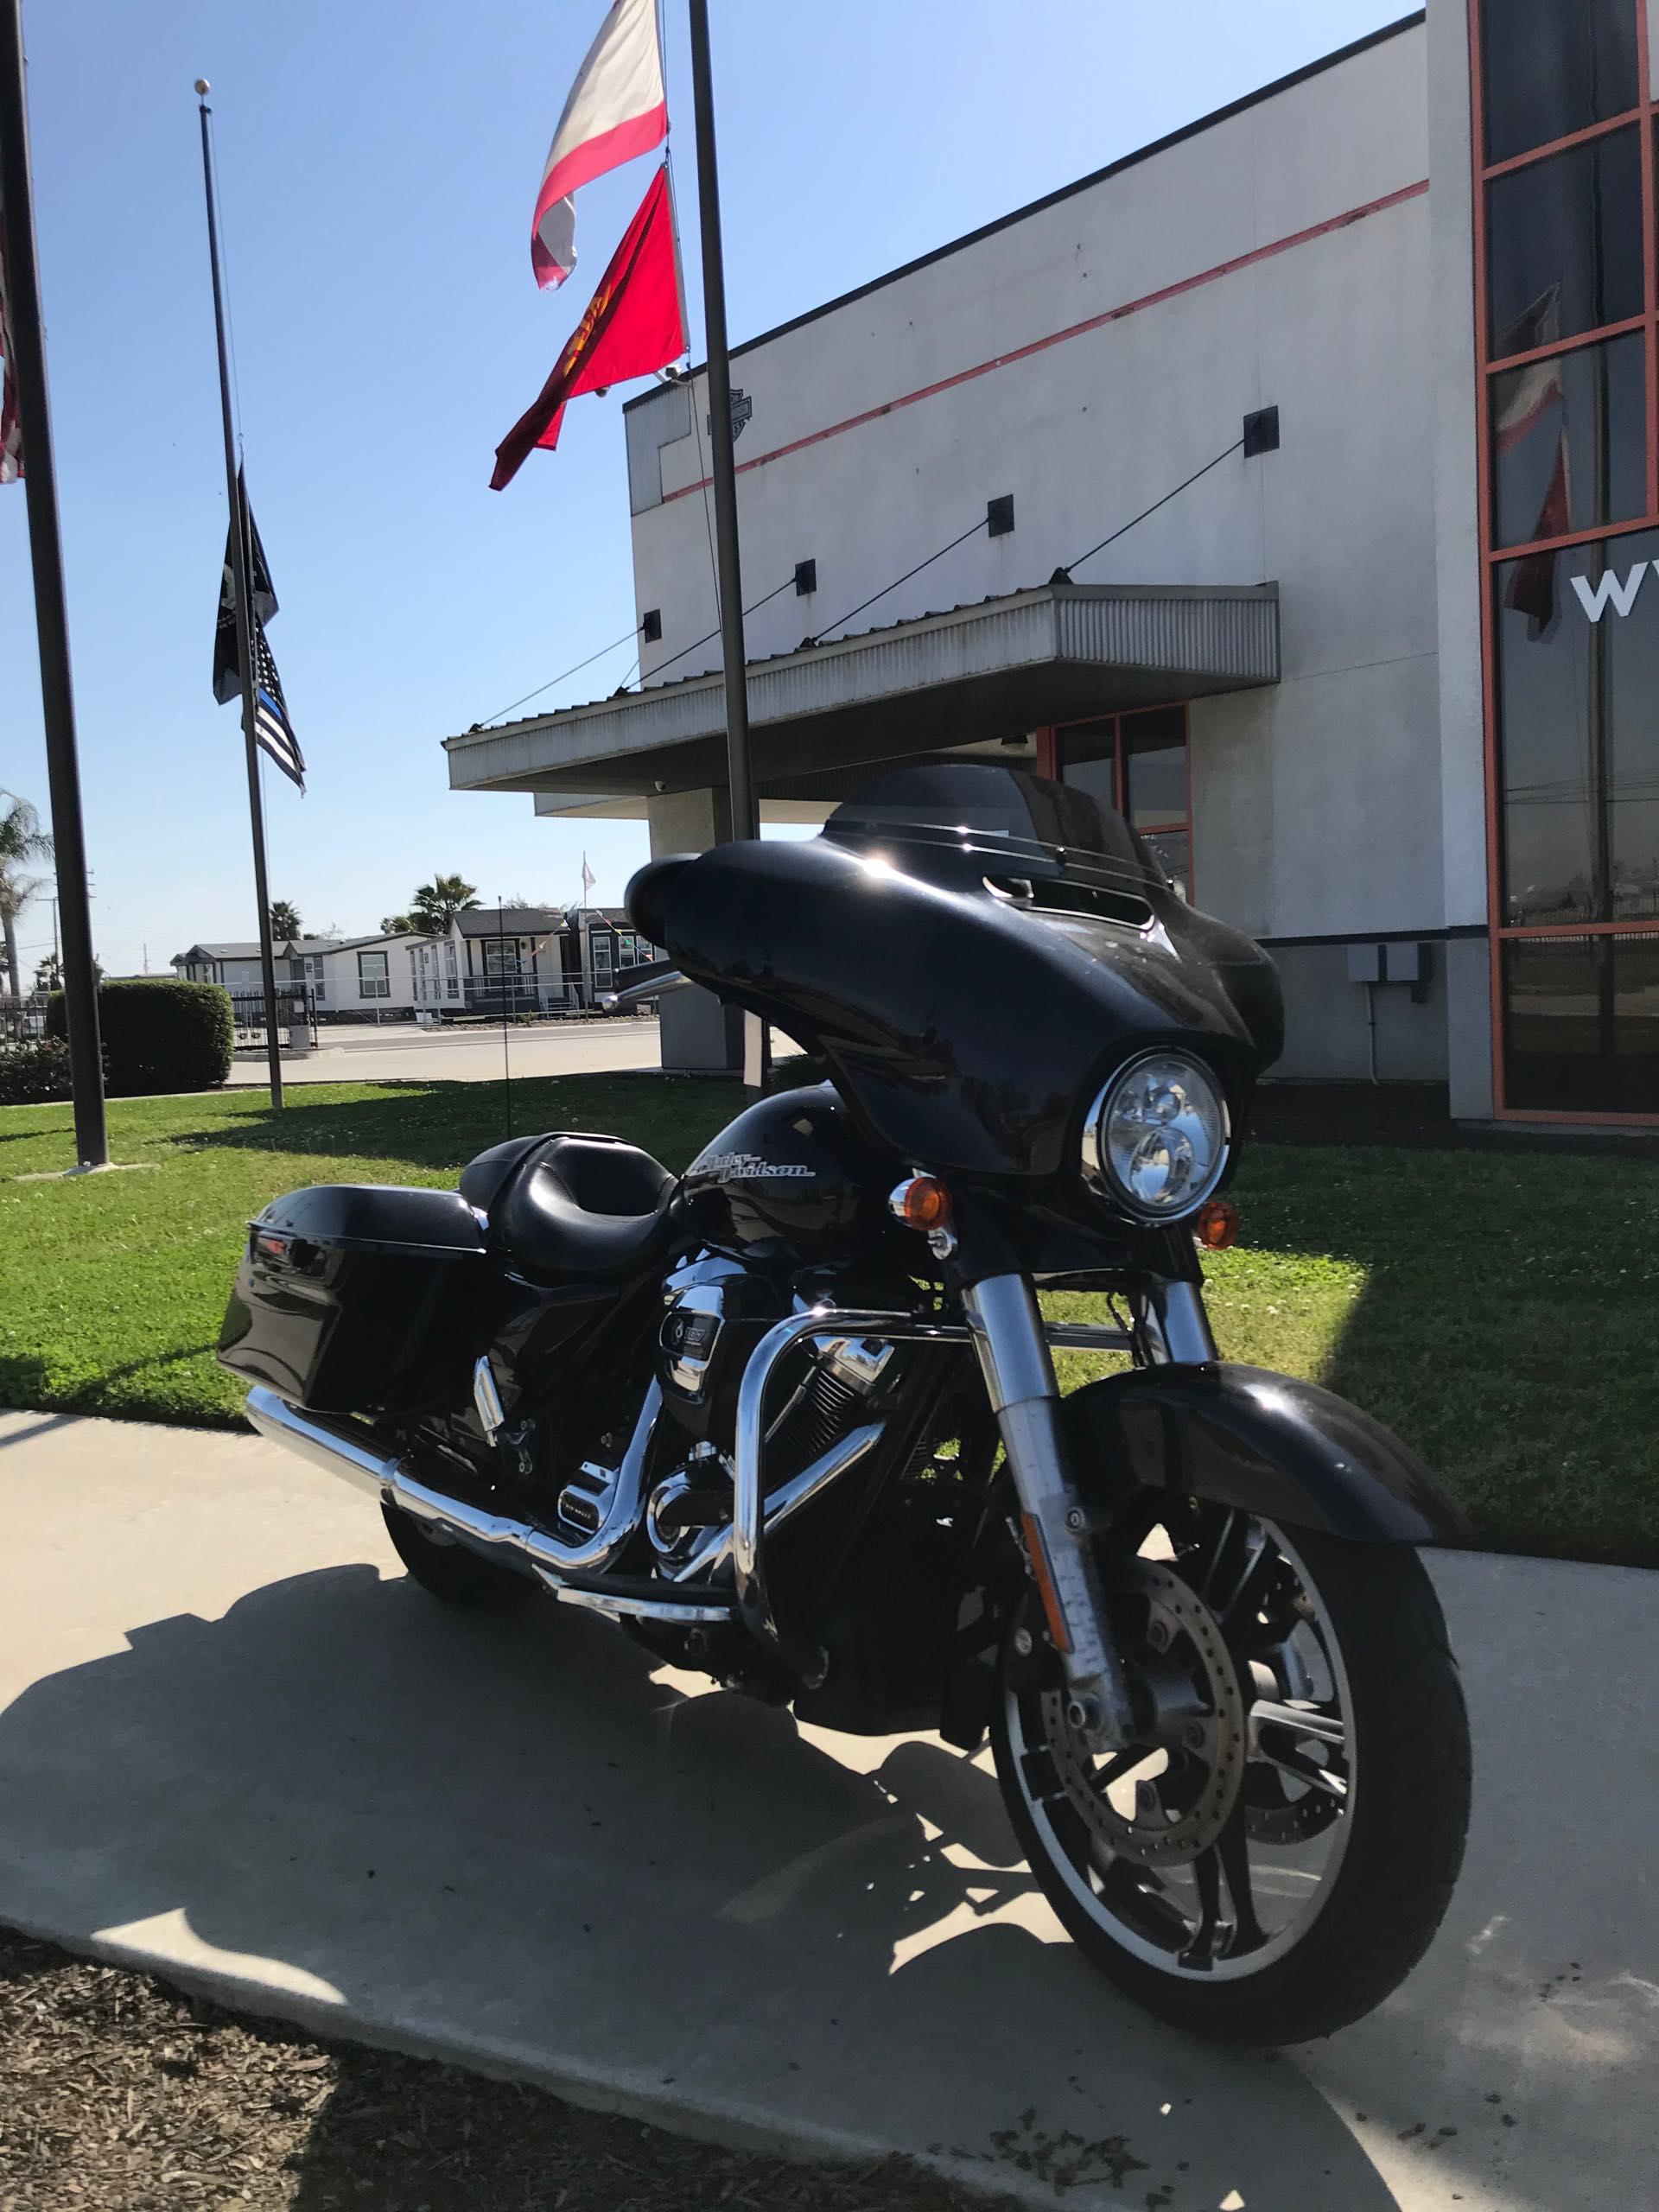 2017 Harley-Davidson Street Glide Special at Visalia Harley-Davidson